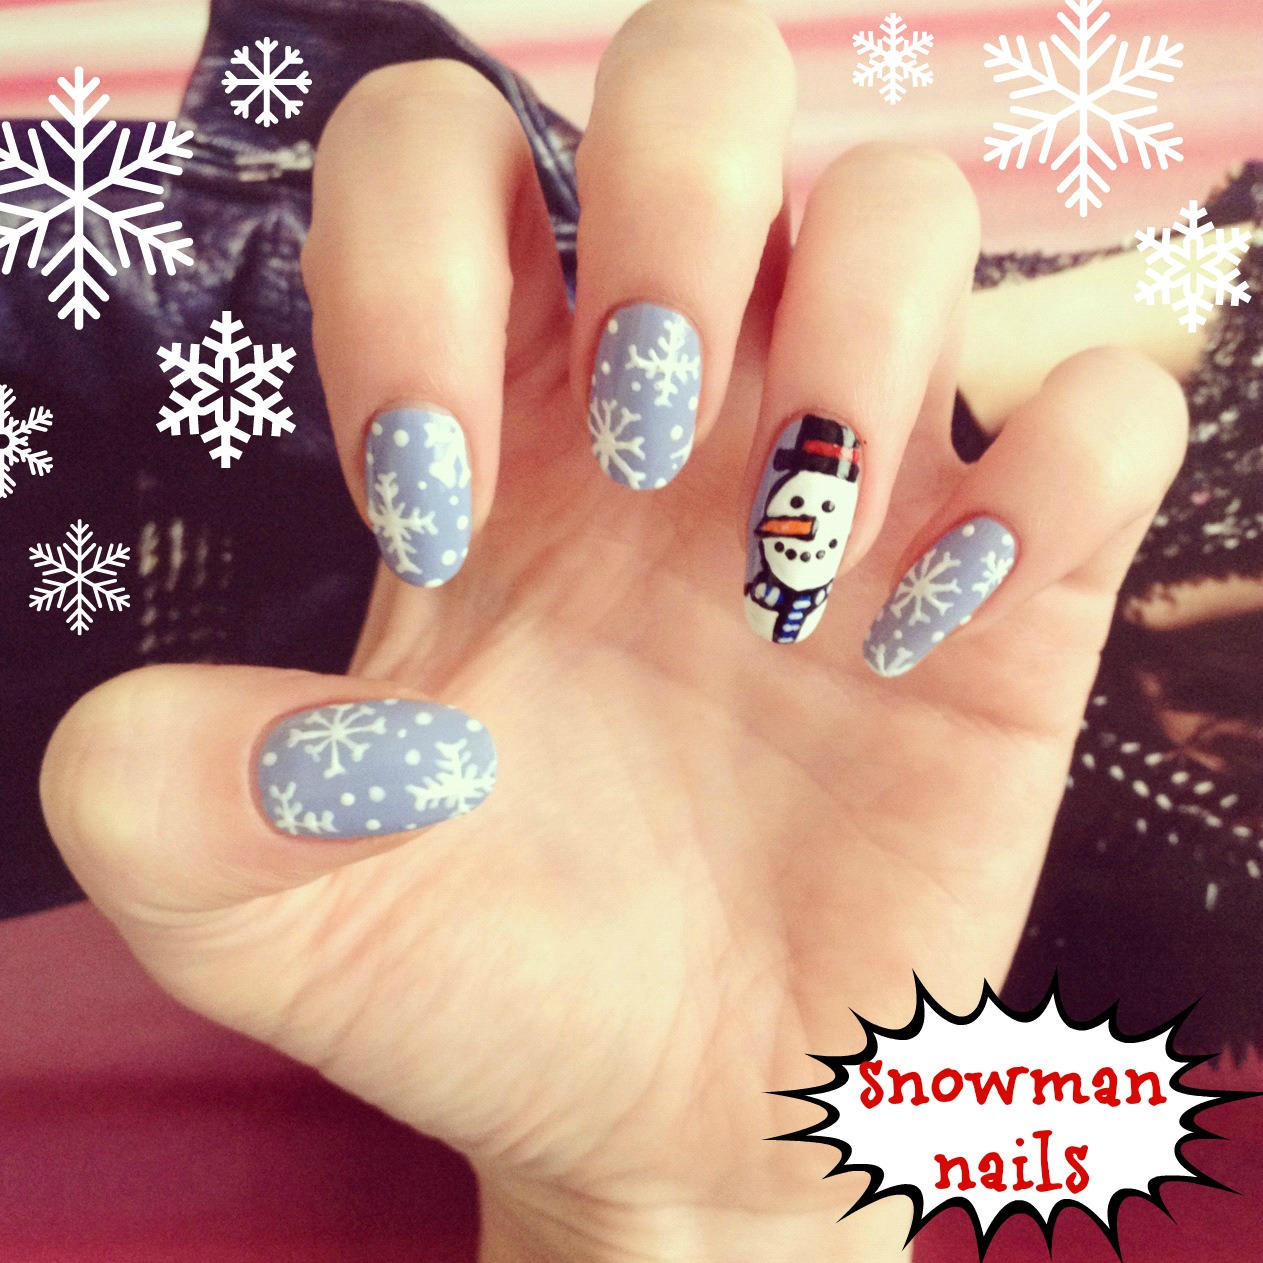 Snowman Nail Art Tutorial: How To: Christmas Snowman Nail Art!